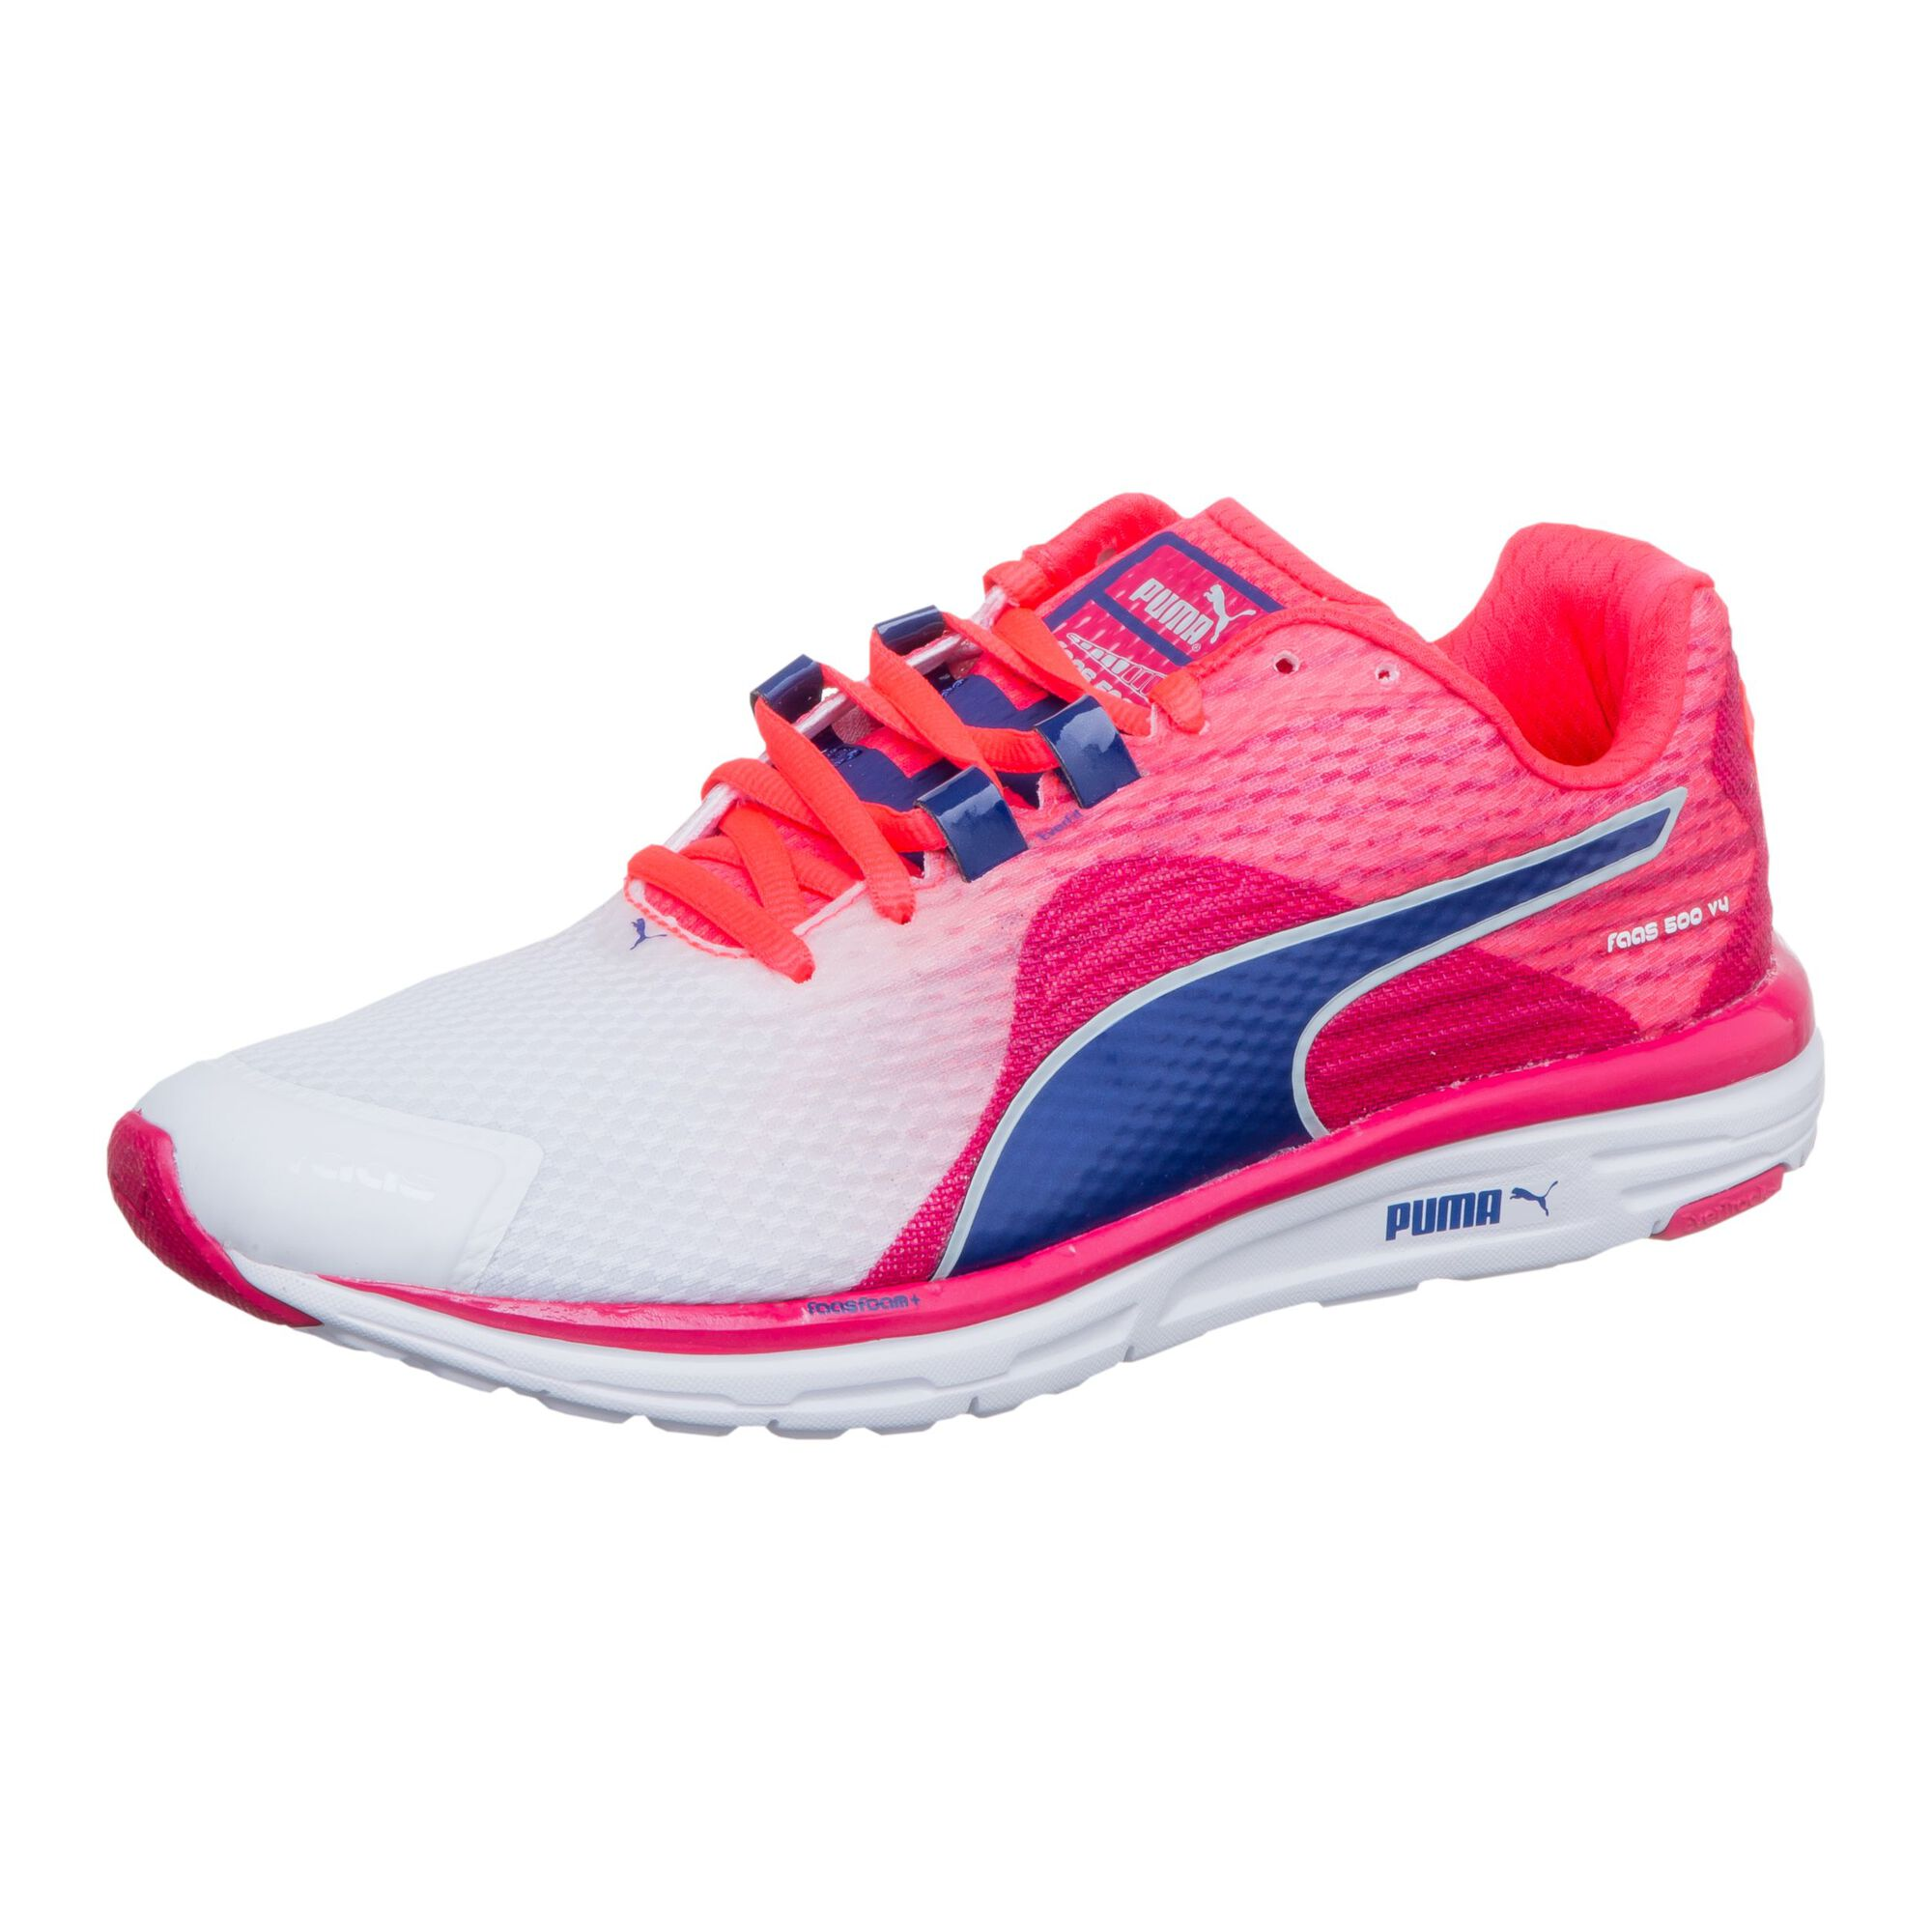 bf70ae742dc buy Puma Faas 500 V4 Neutral Running Shoe Women - White